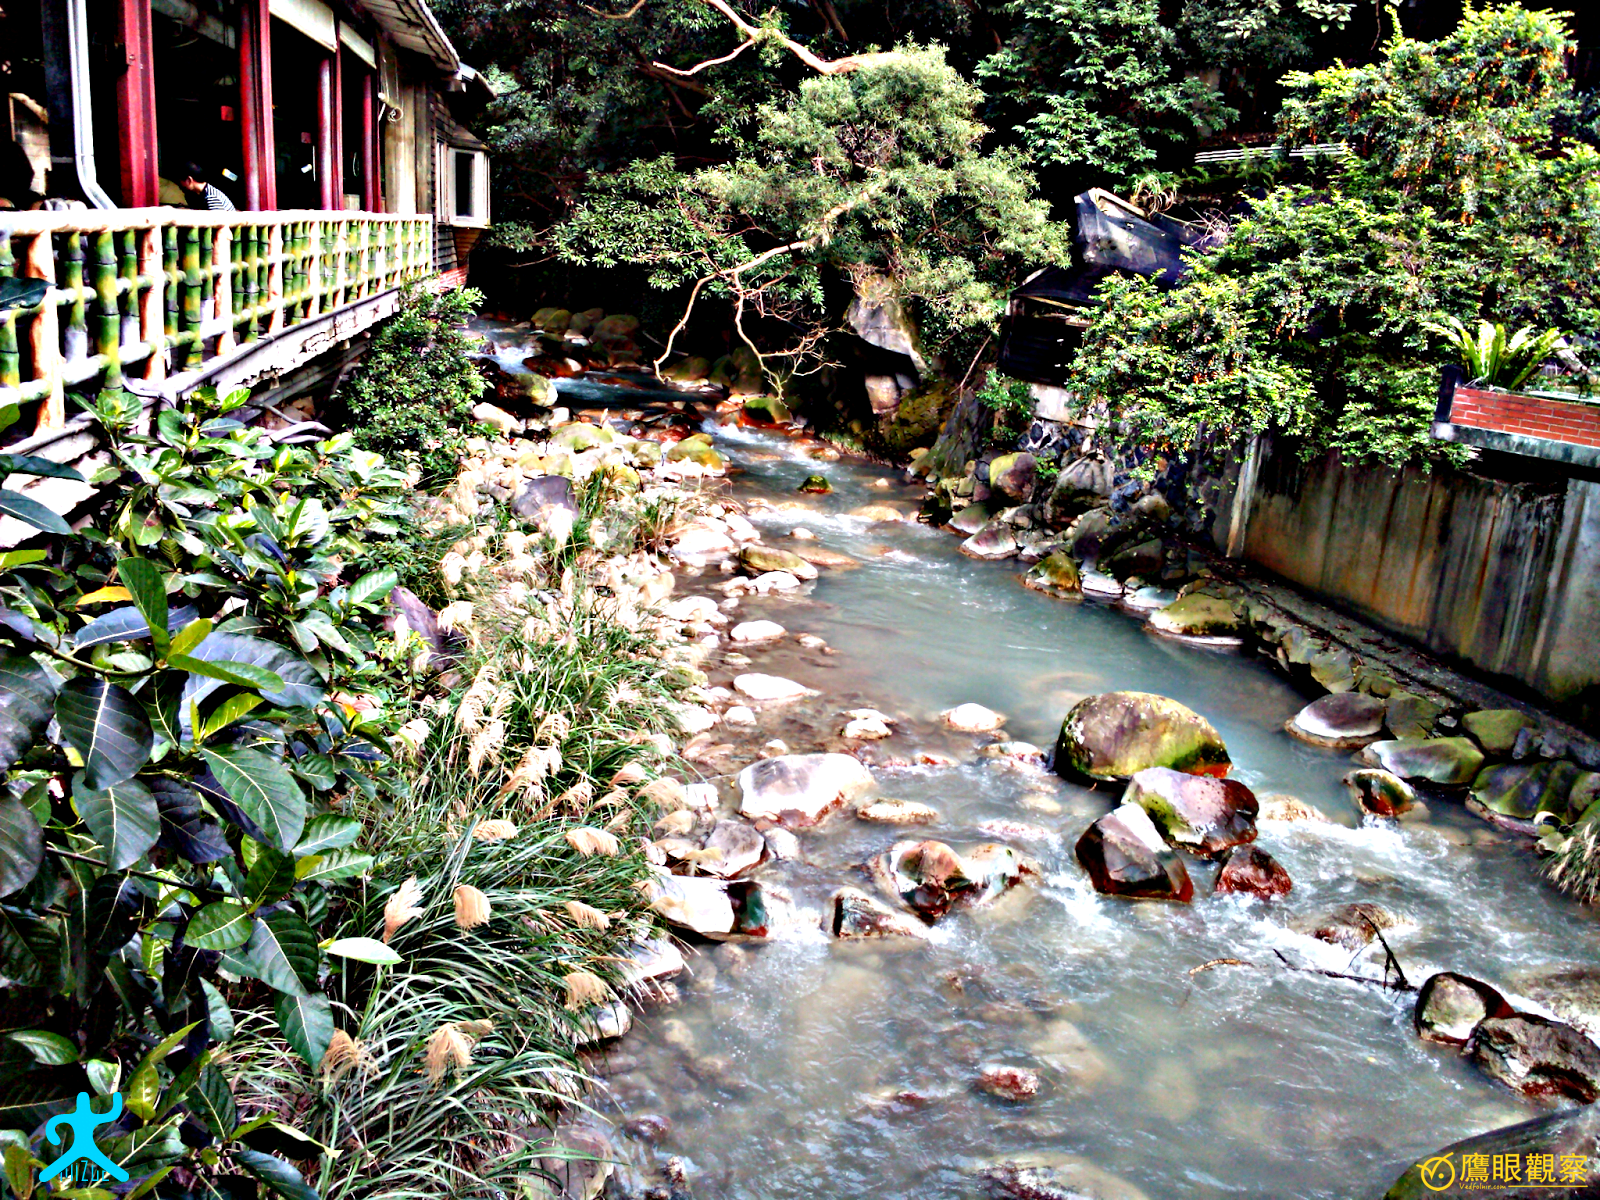 hot spring taipei beitou yangmingshan bathhouse tienhsiang 01 北投「天祥溫泉餐廳」台北泡湯的好地方